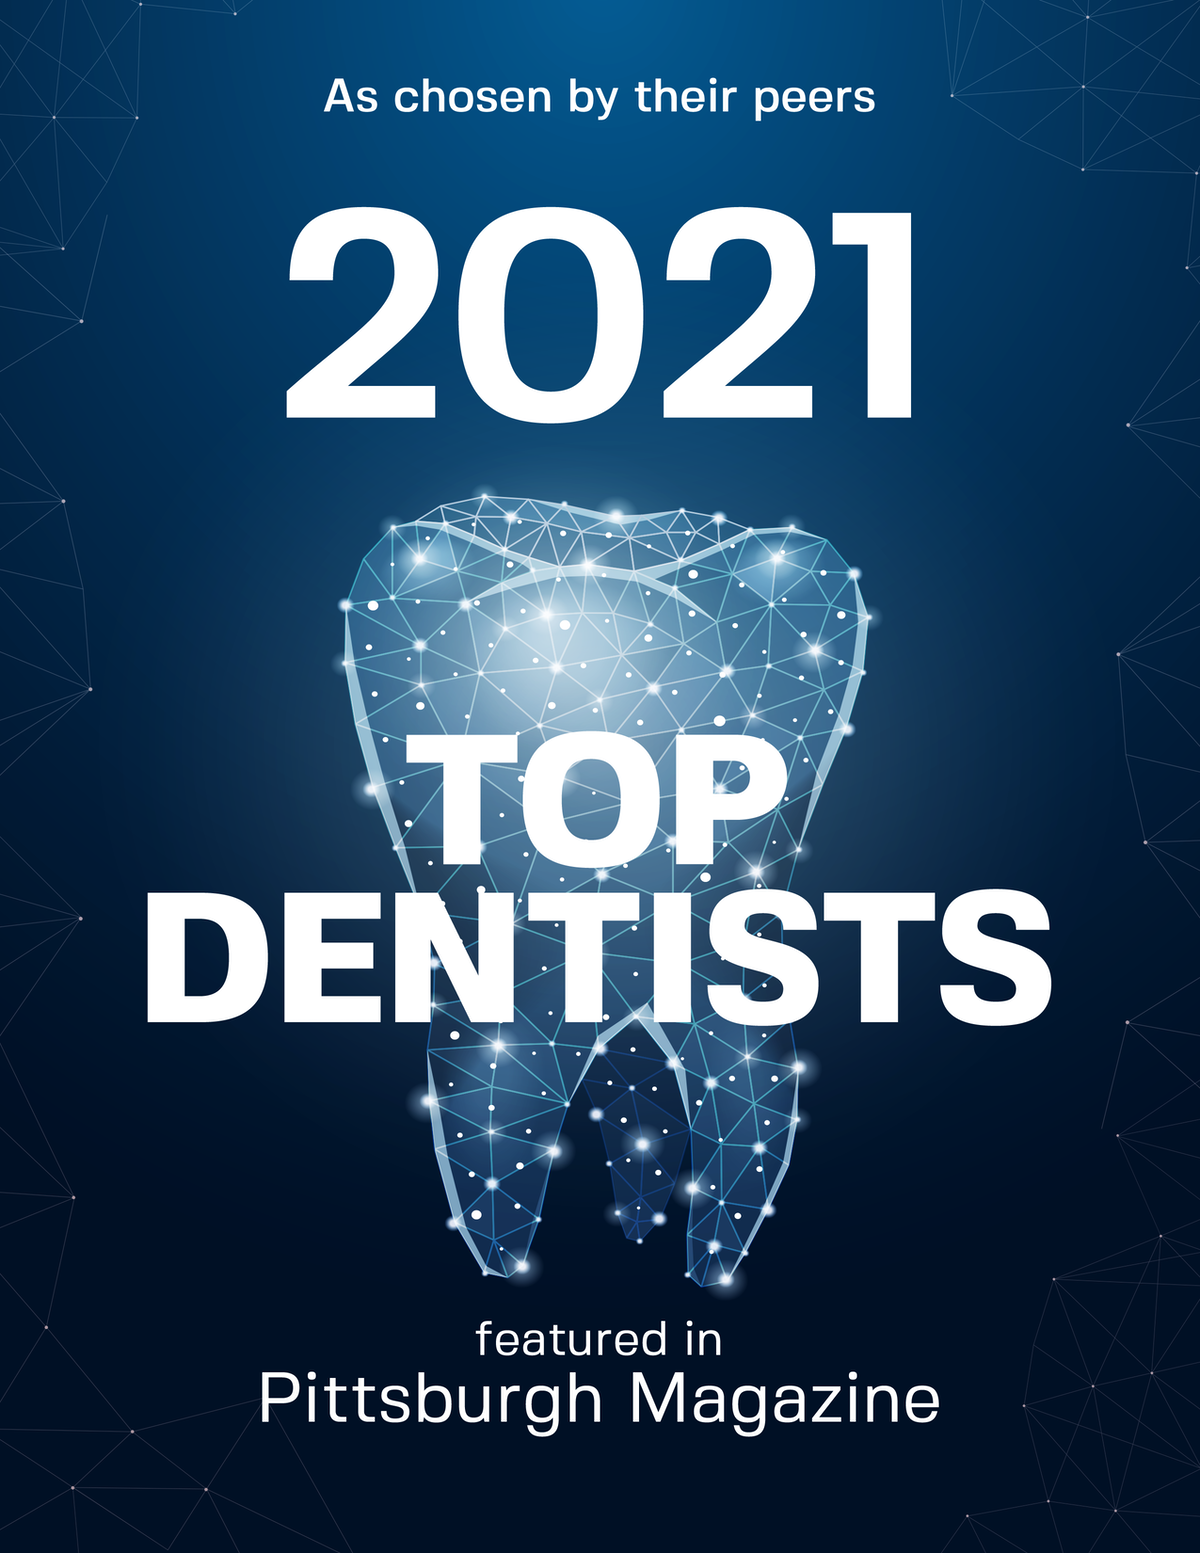 Dentist Design #2 - 2021